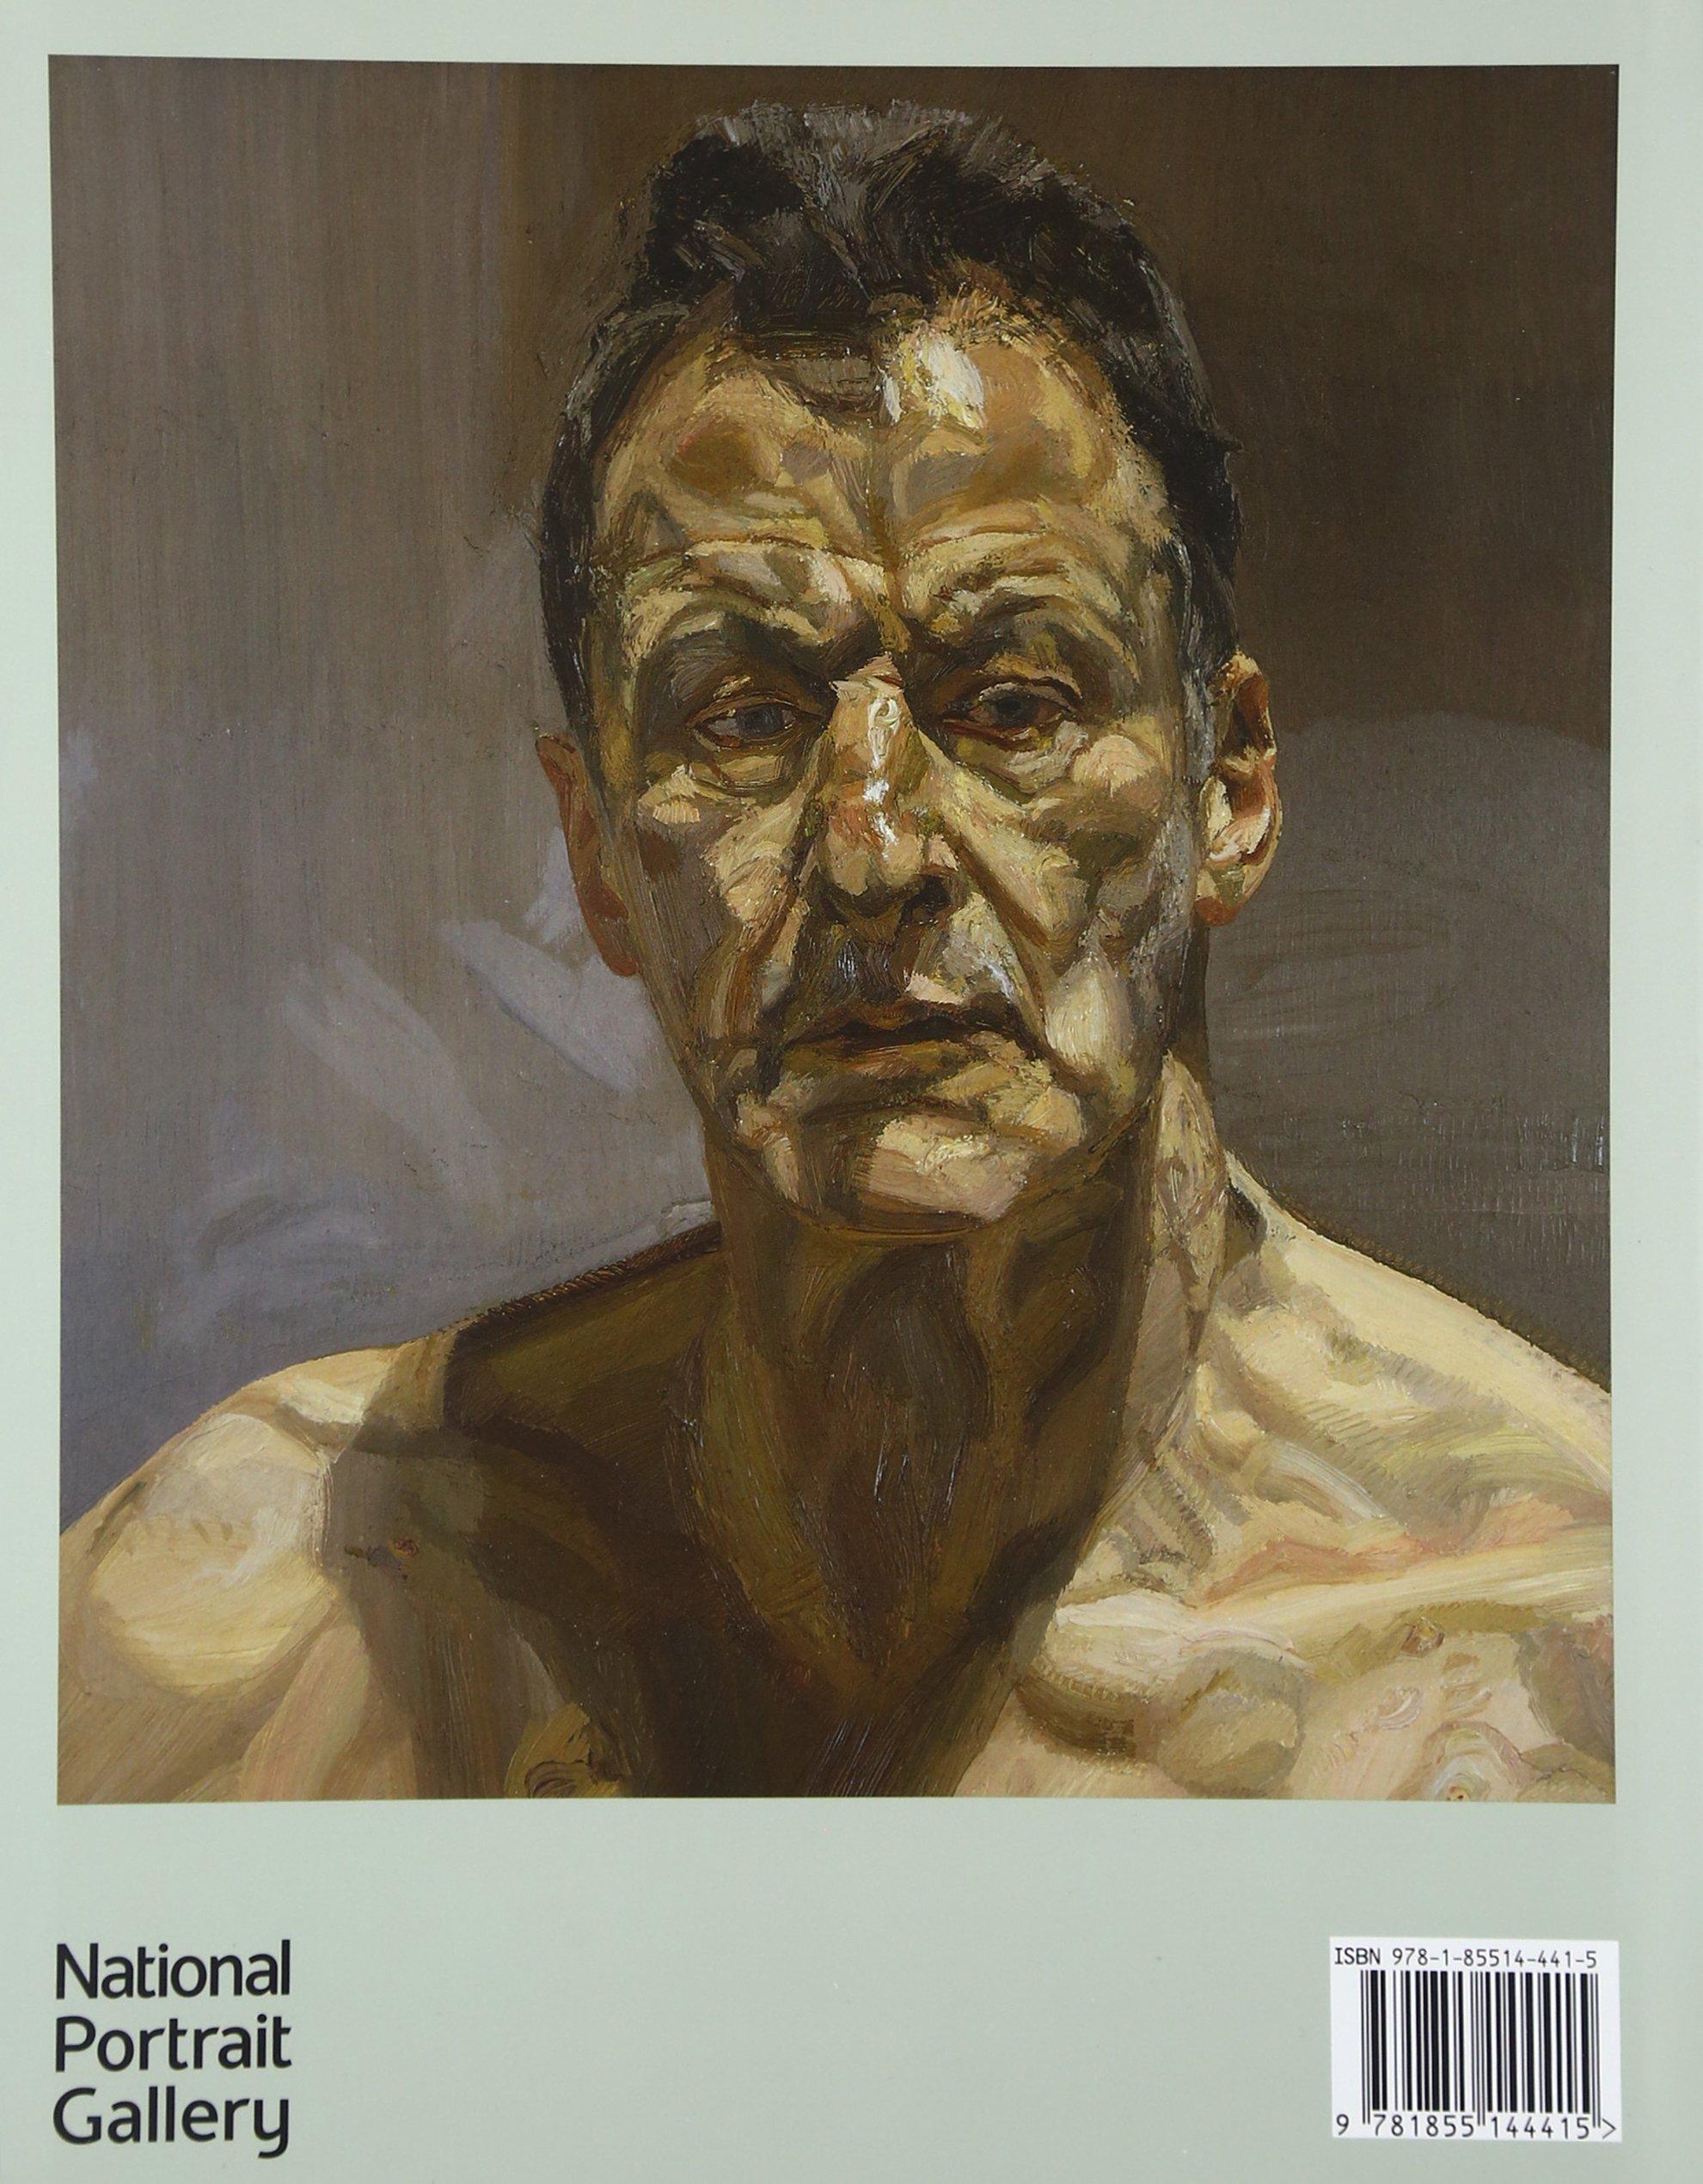 Lucian Freud Portraits: Amazon.es: Sarah Howgate: Libros en idiomas extranjeros